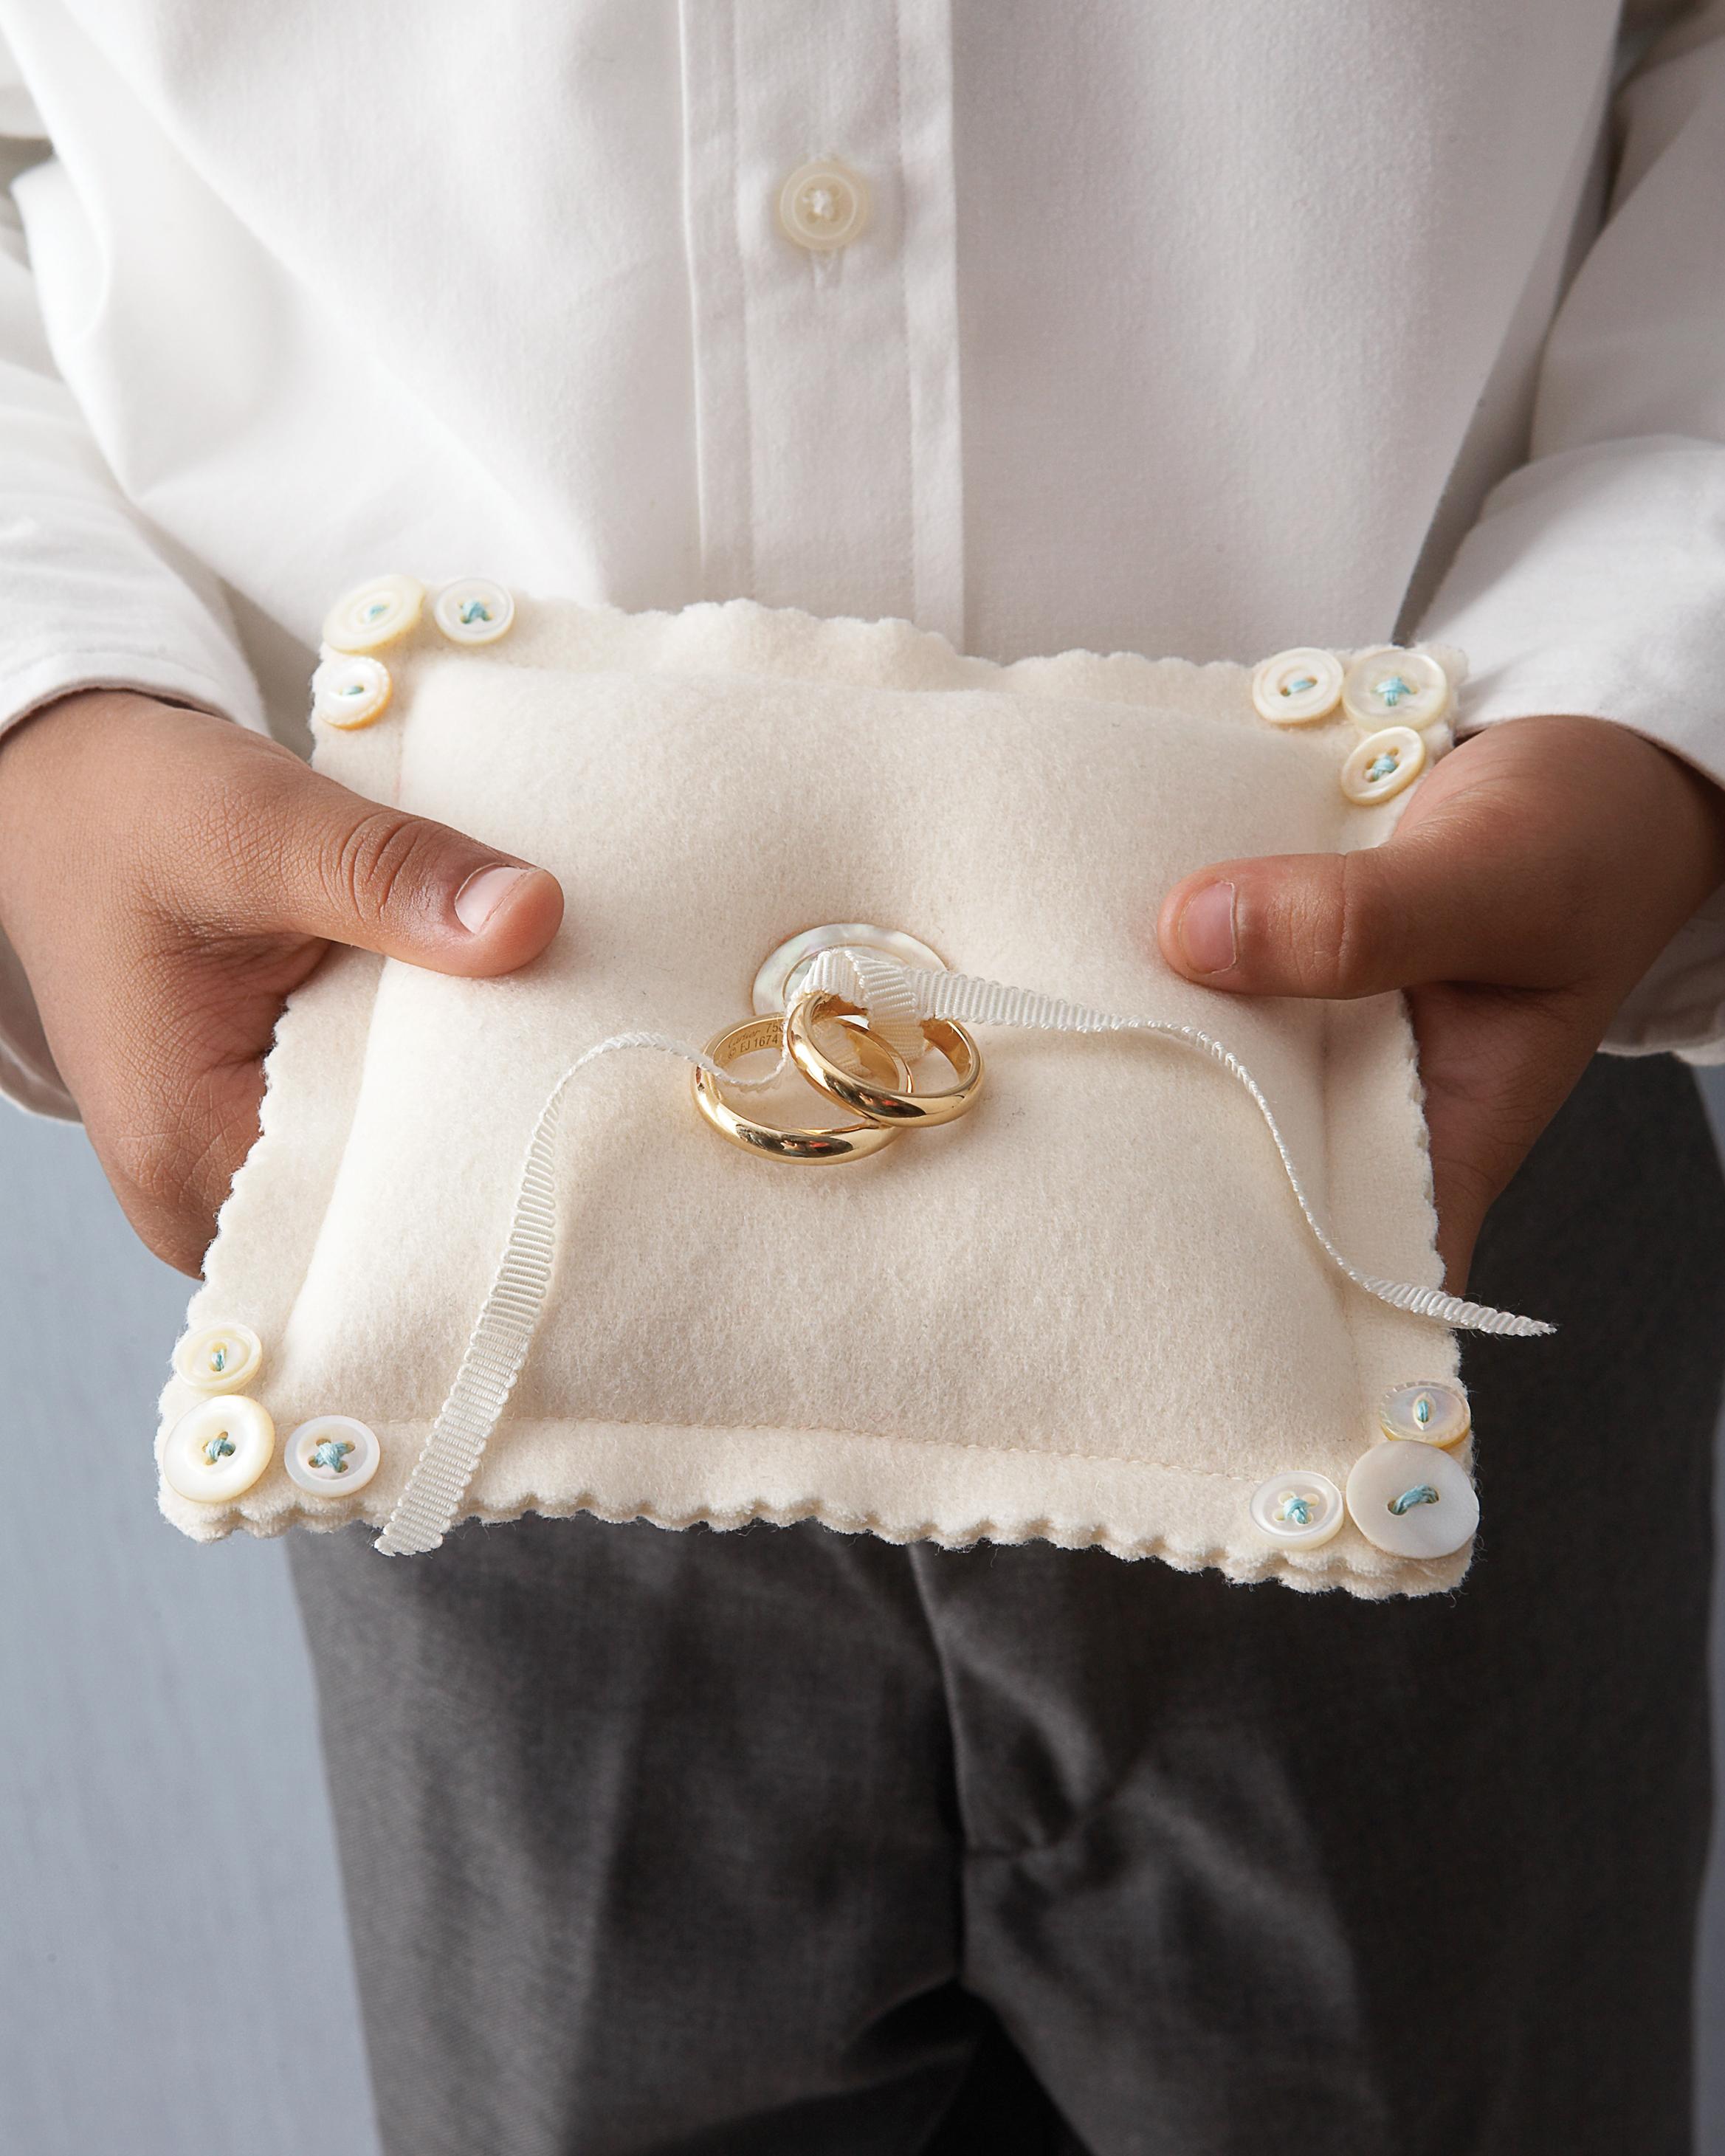 diy-ring-pillows-mwd103331-buttons-0515.jpg